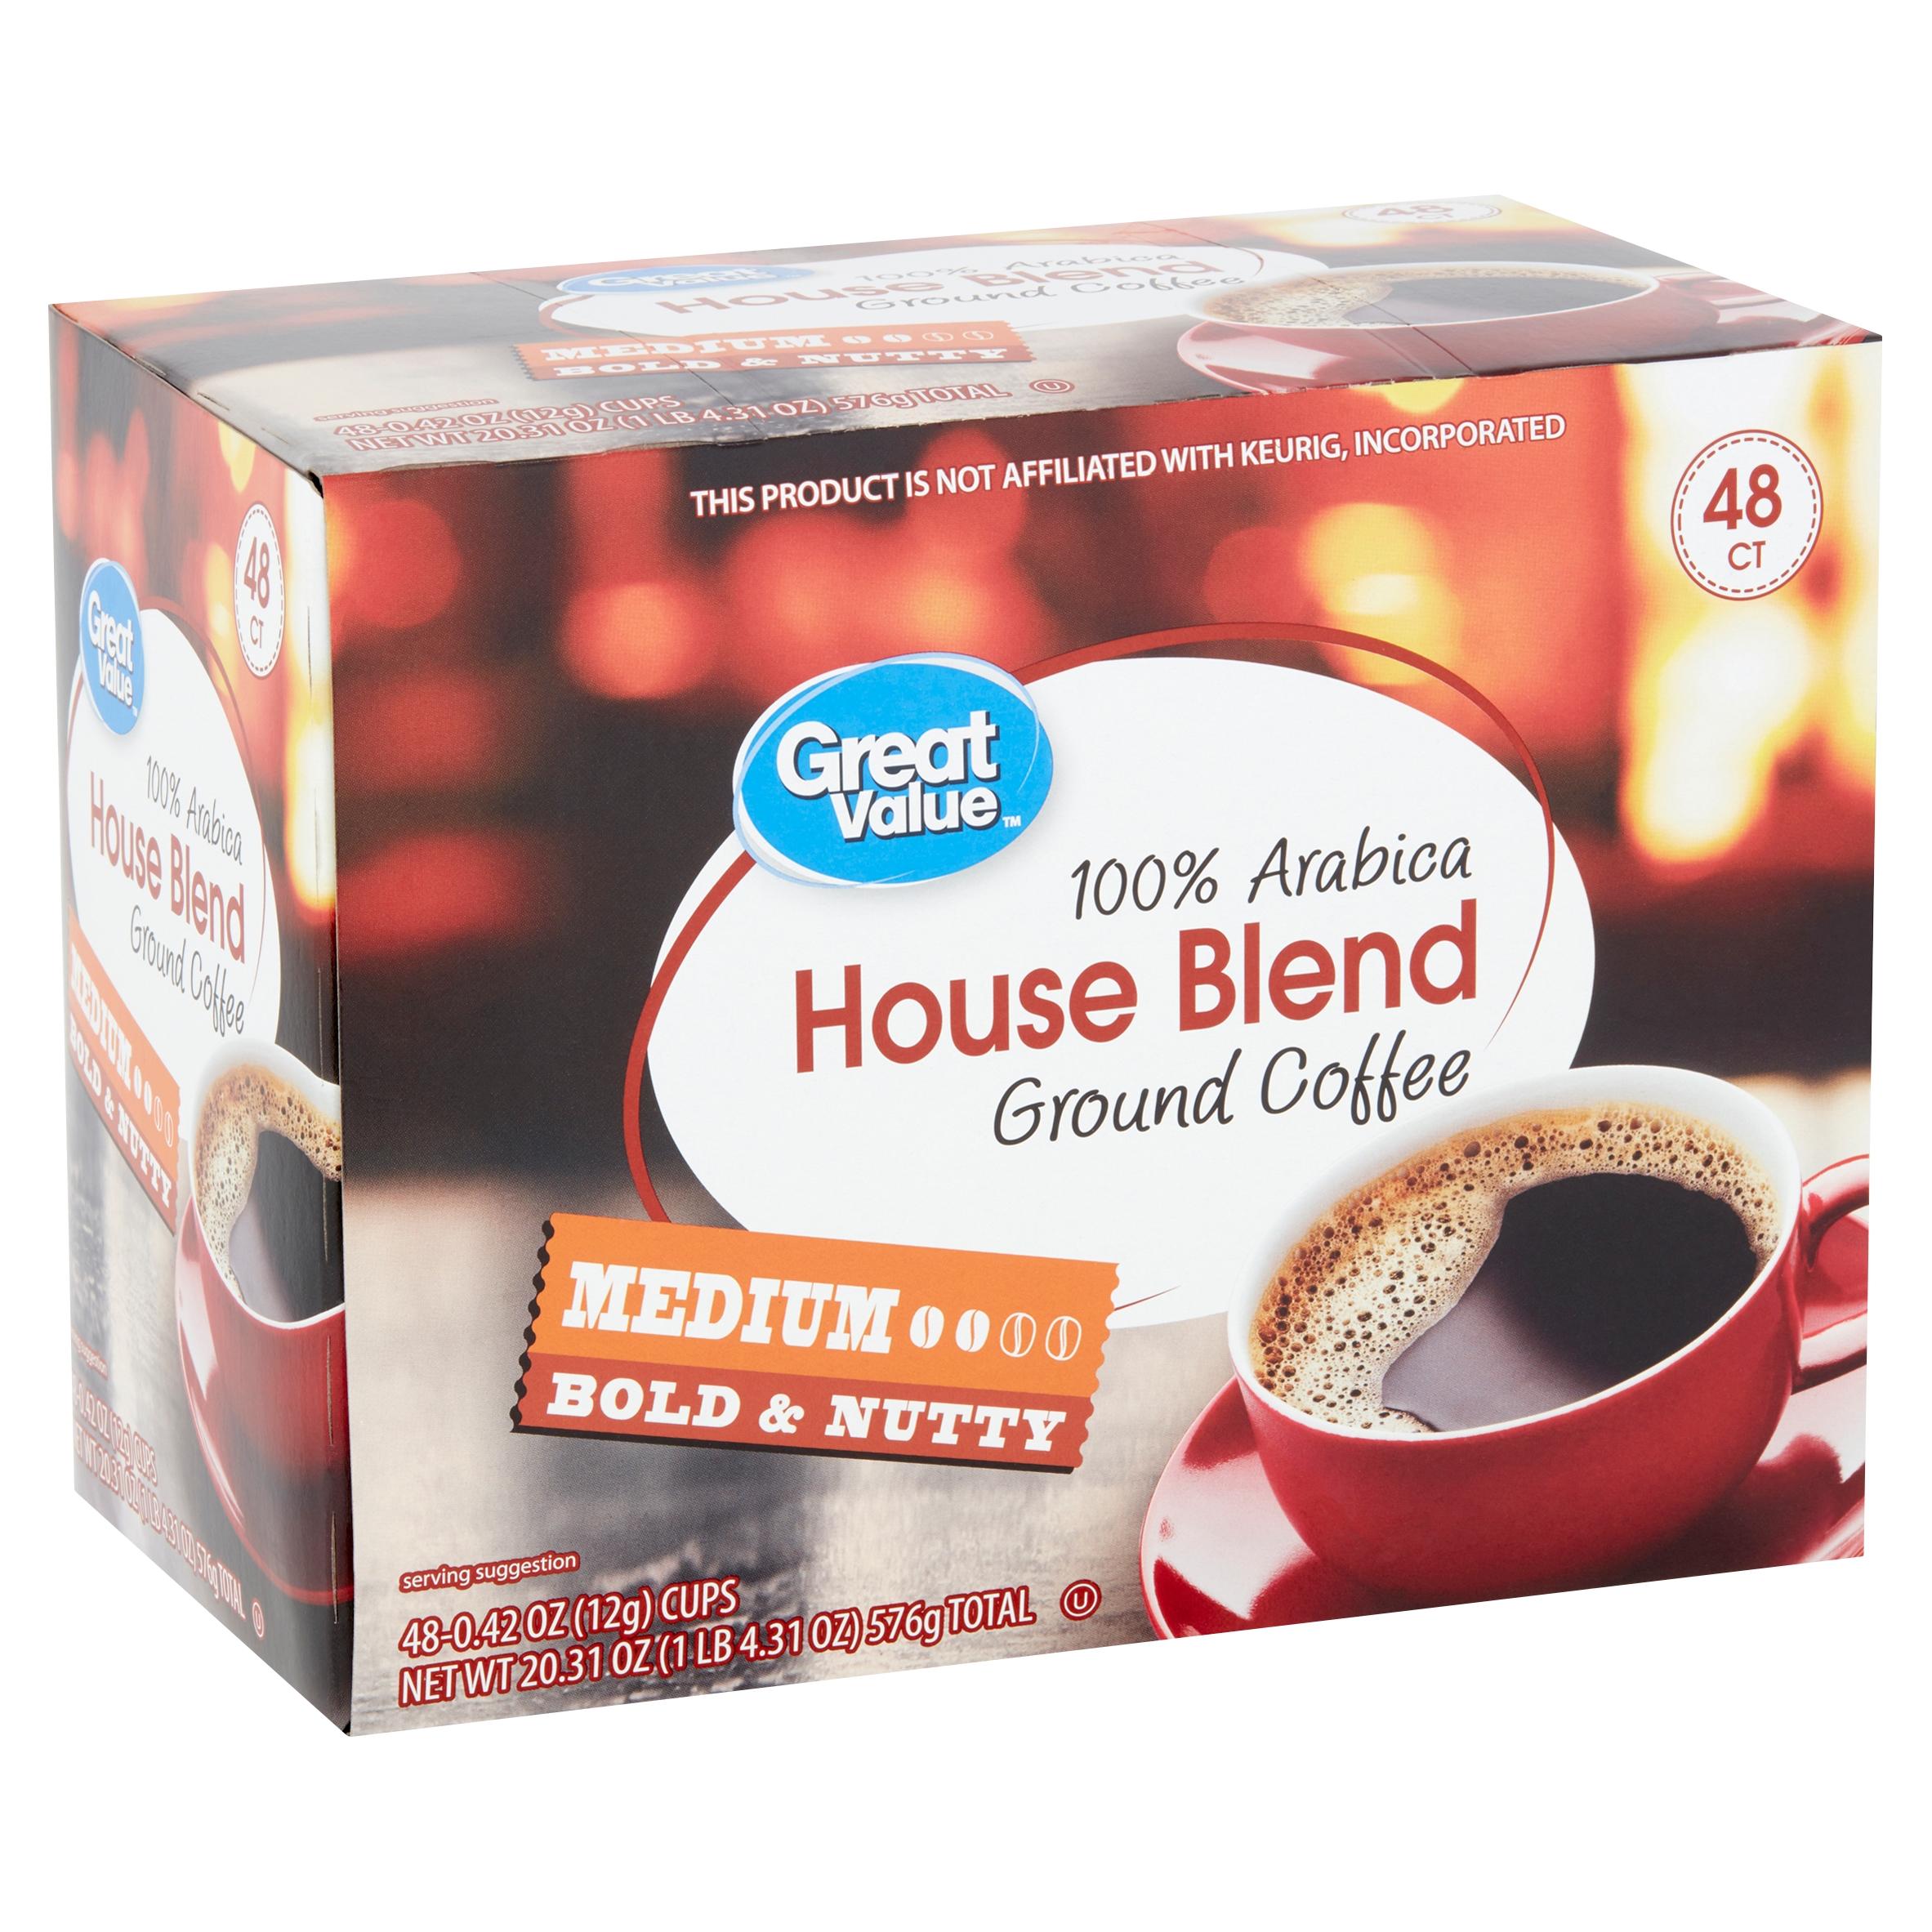 Great Value 100% Arabica House Blend Medium Ground Coffee, 0.42 oz, 48 count